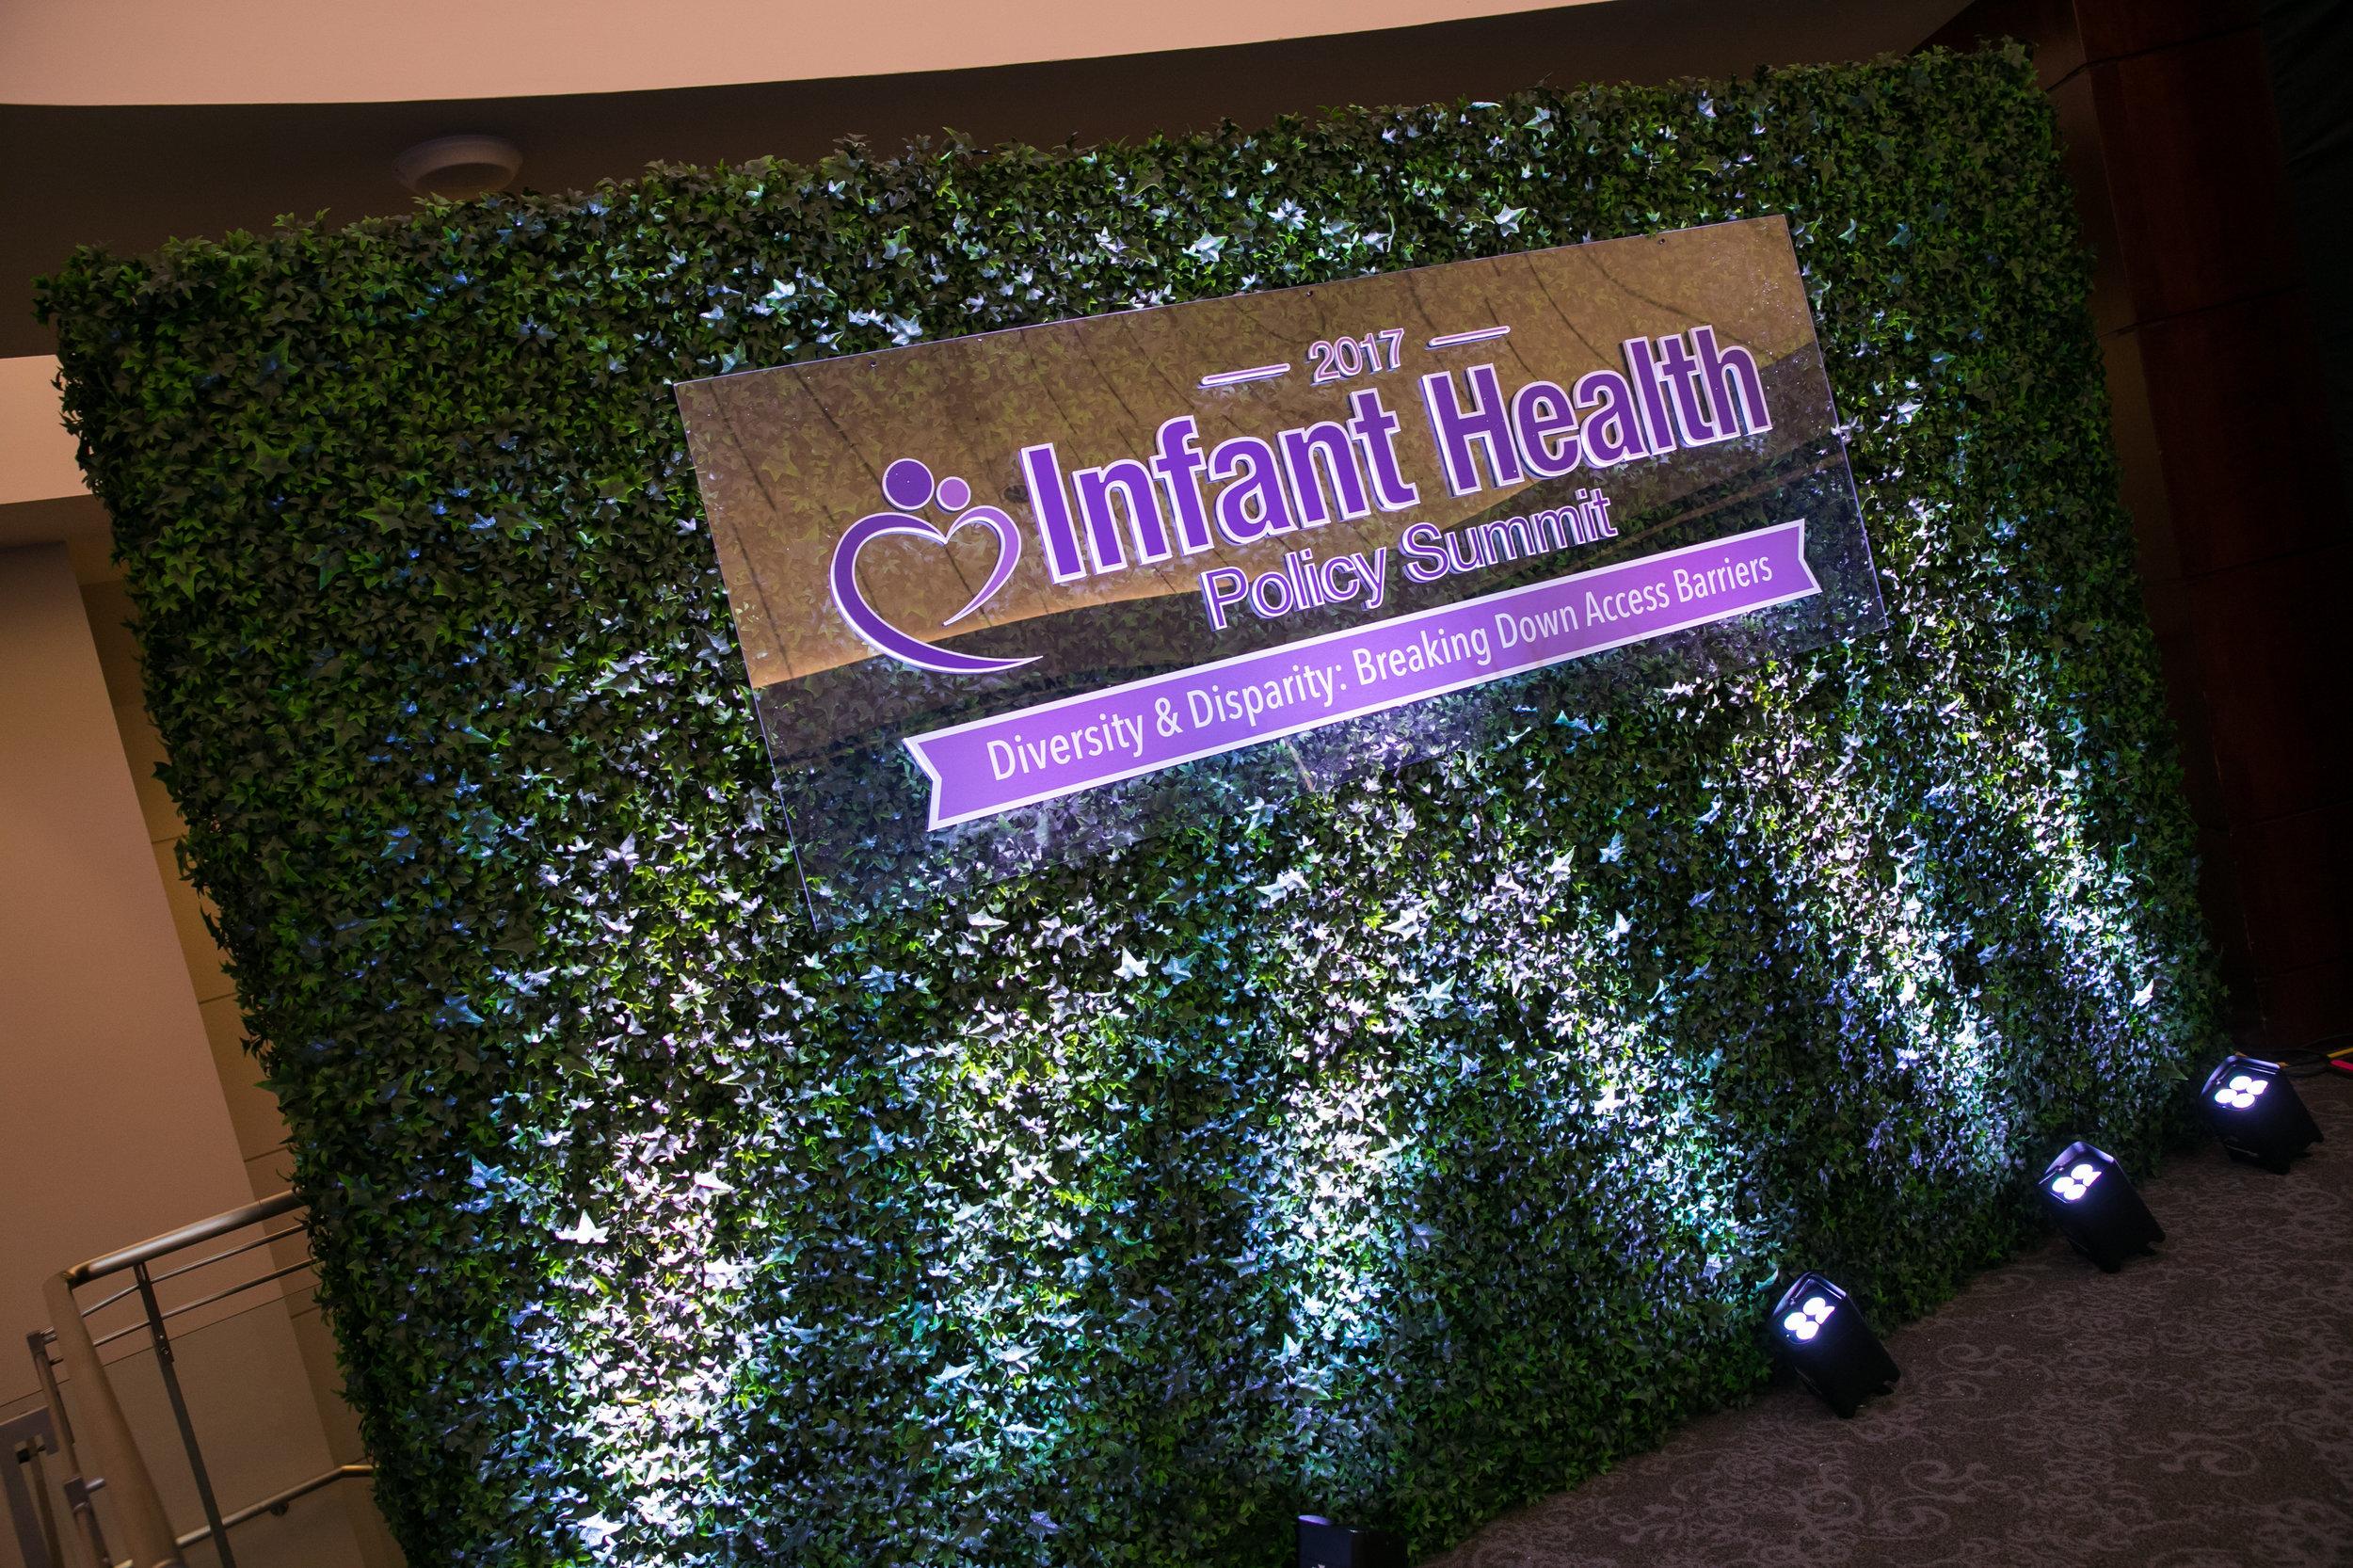 Infant Health Policy Summit - Jason Dixson Photography - 084752 - 0024.jpg